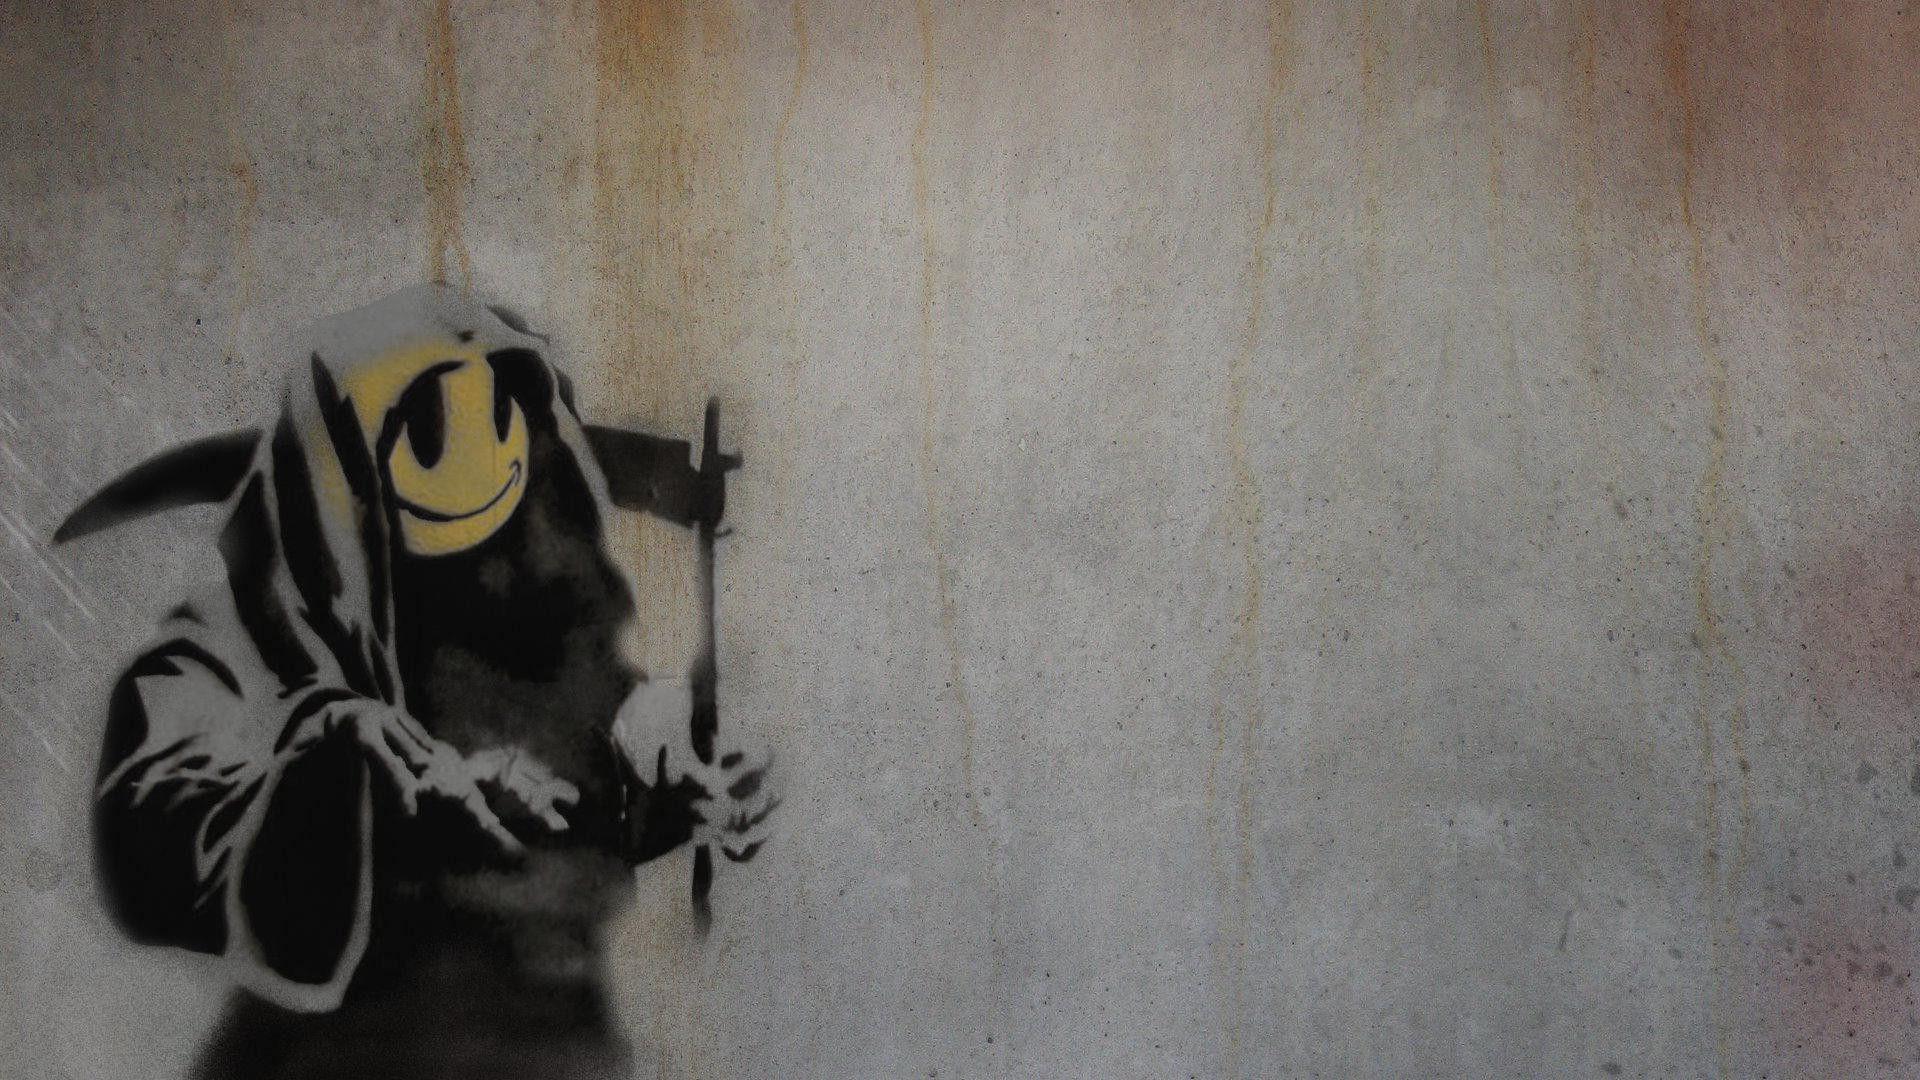 banksy hd wallpapers wallpaper cave